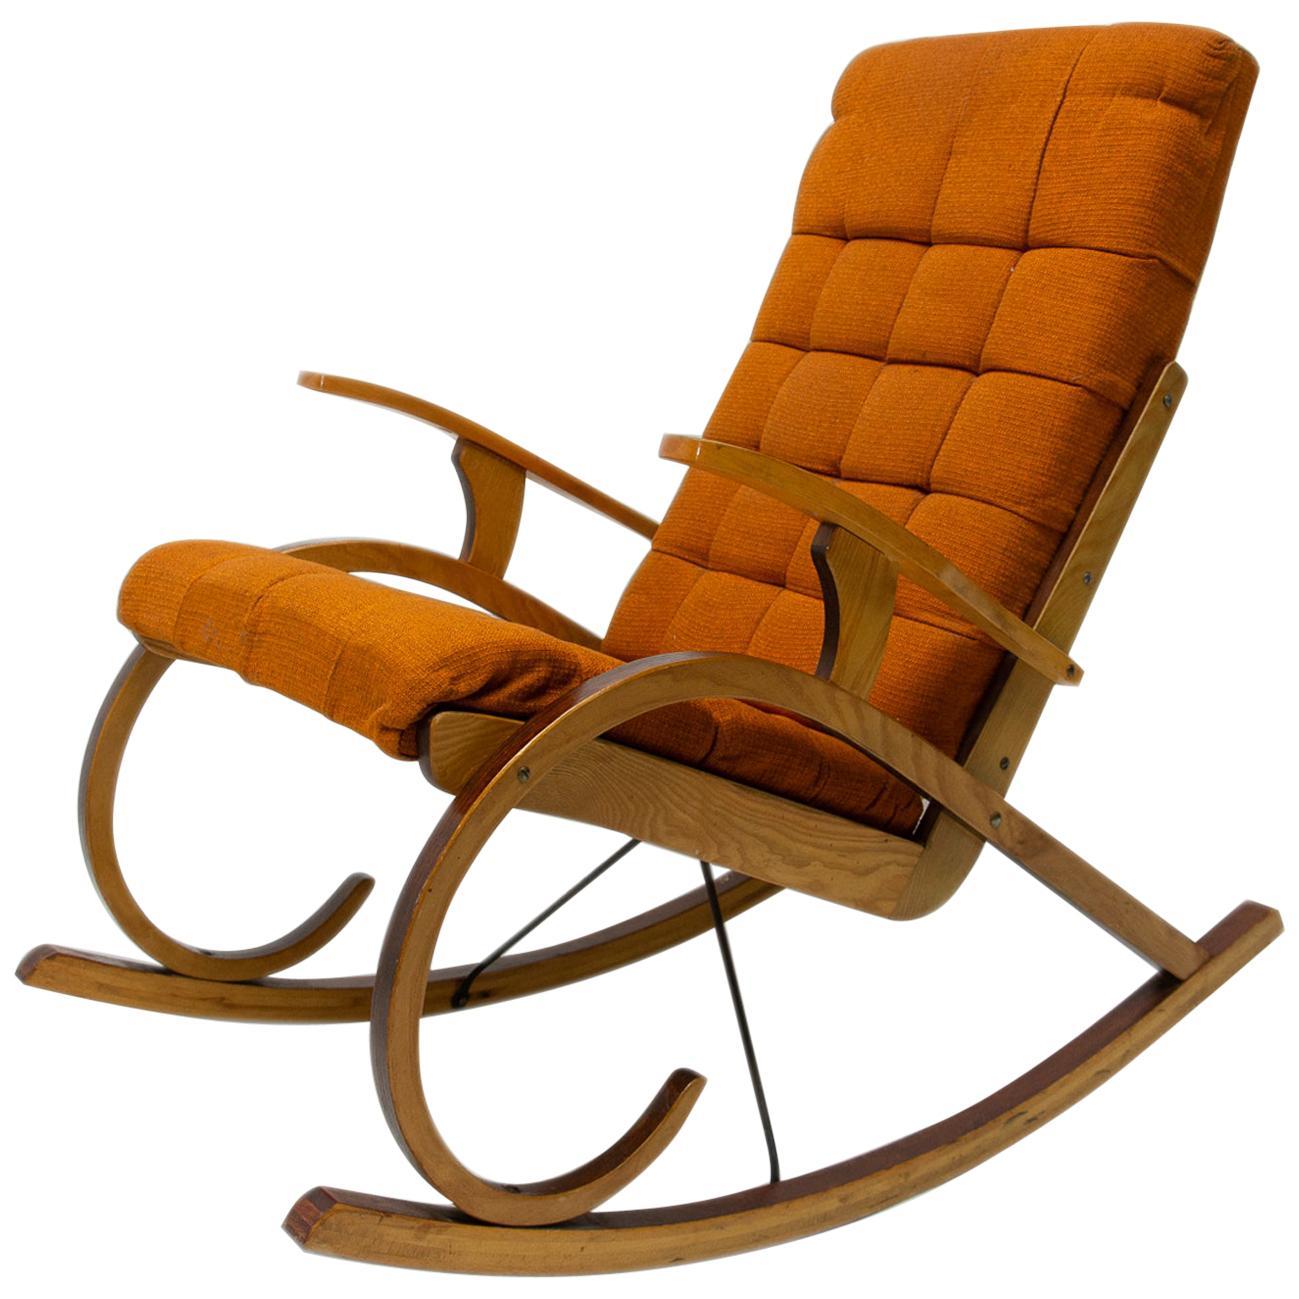 Midcentury Bentwood Rocking Chair, Czechoslovakia, 1960s